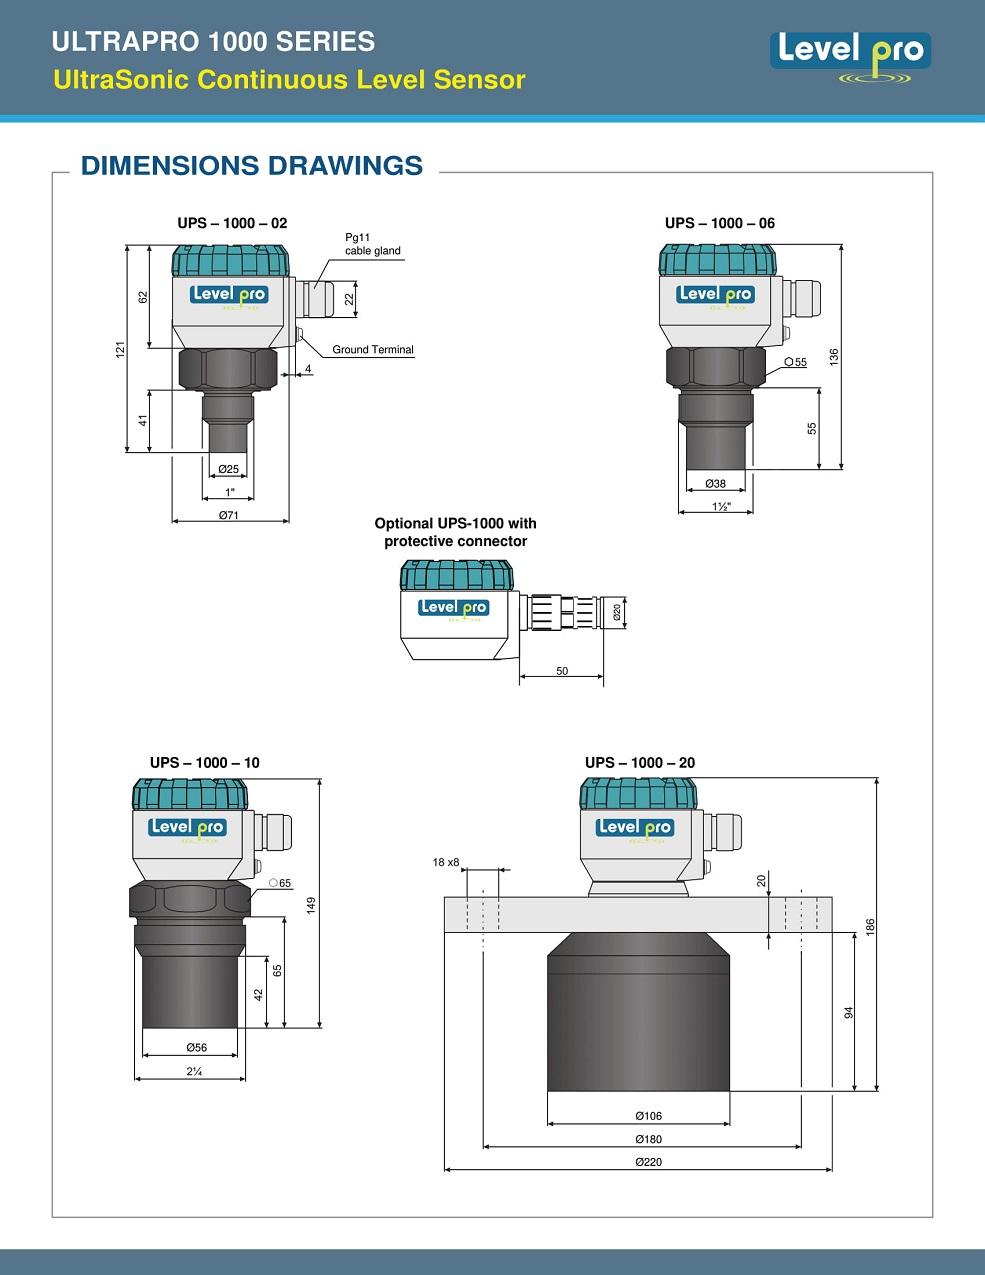 ULTRAPRO 1000 UltraSonic Continuous Level Sensor